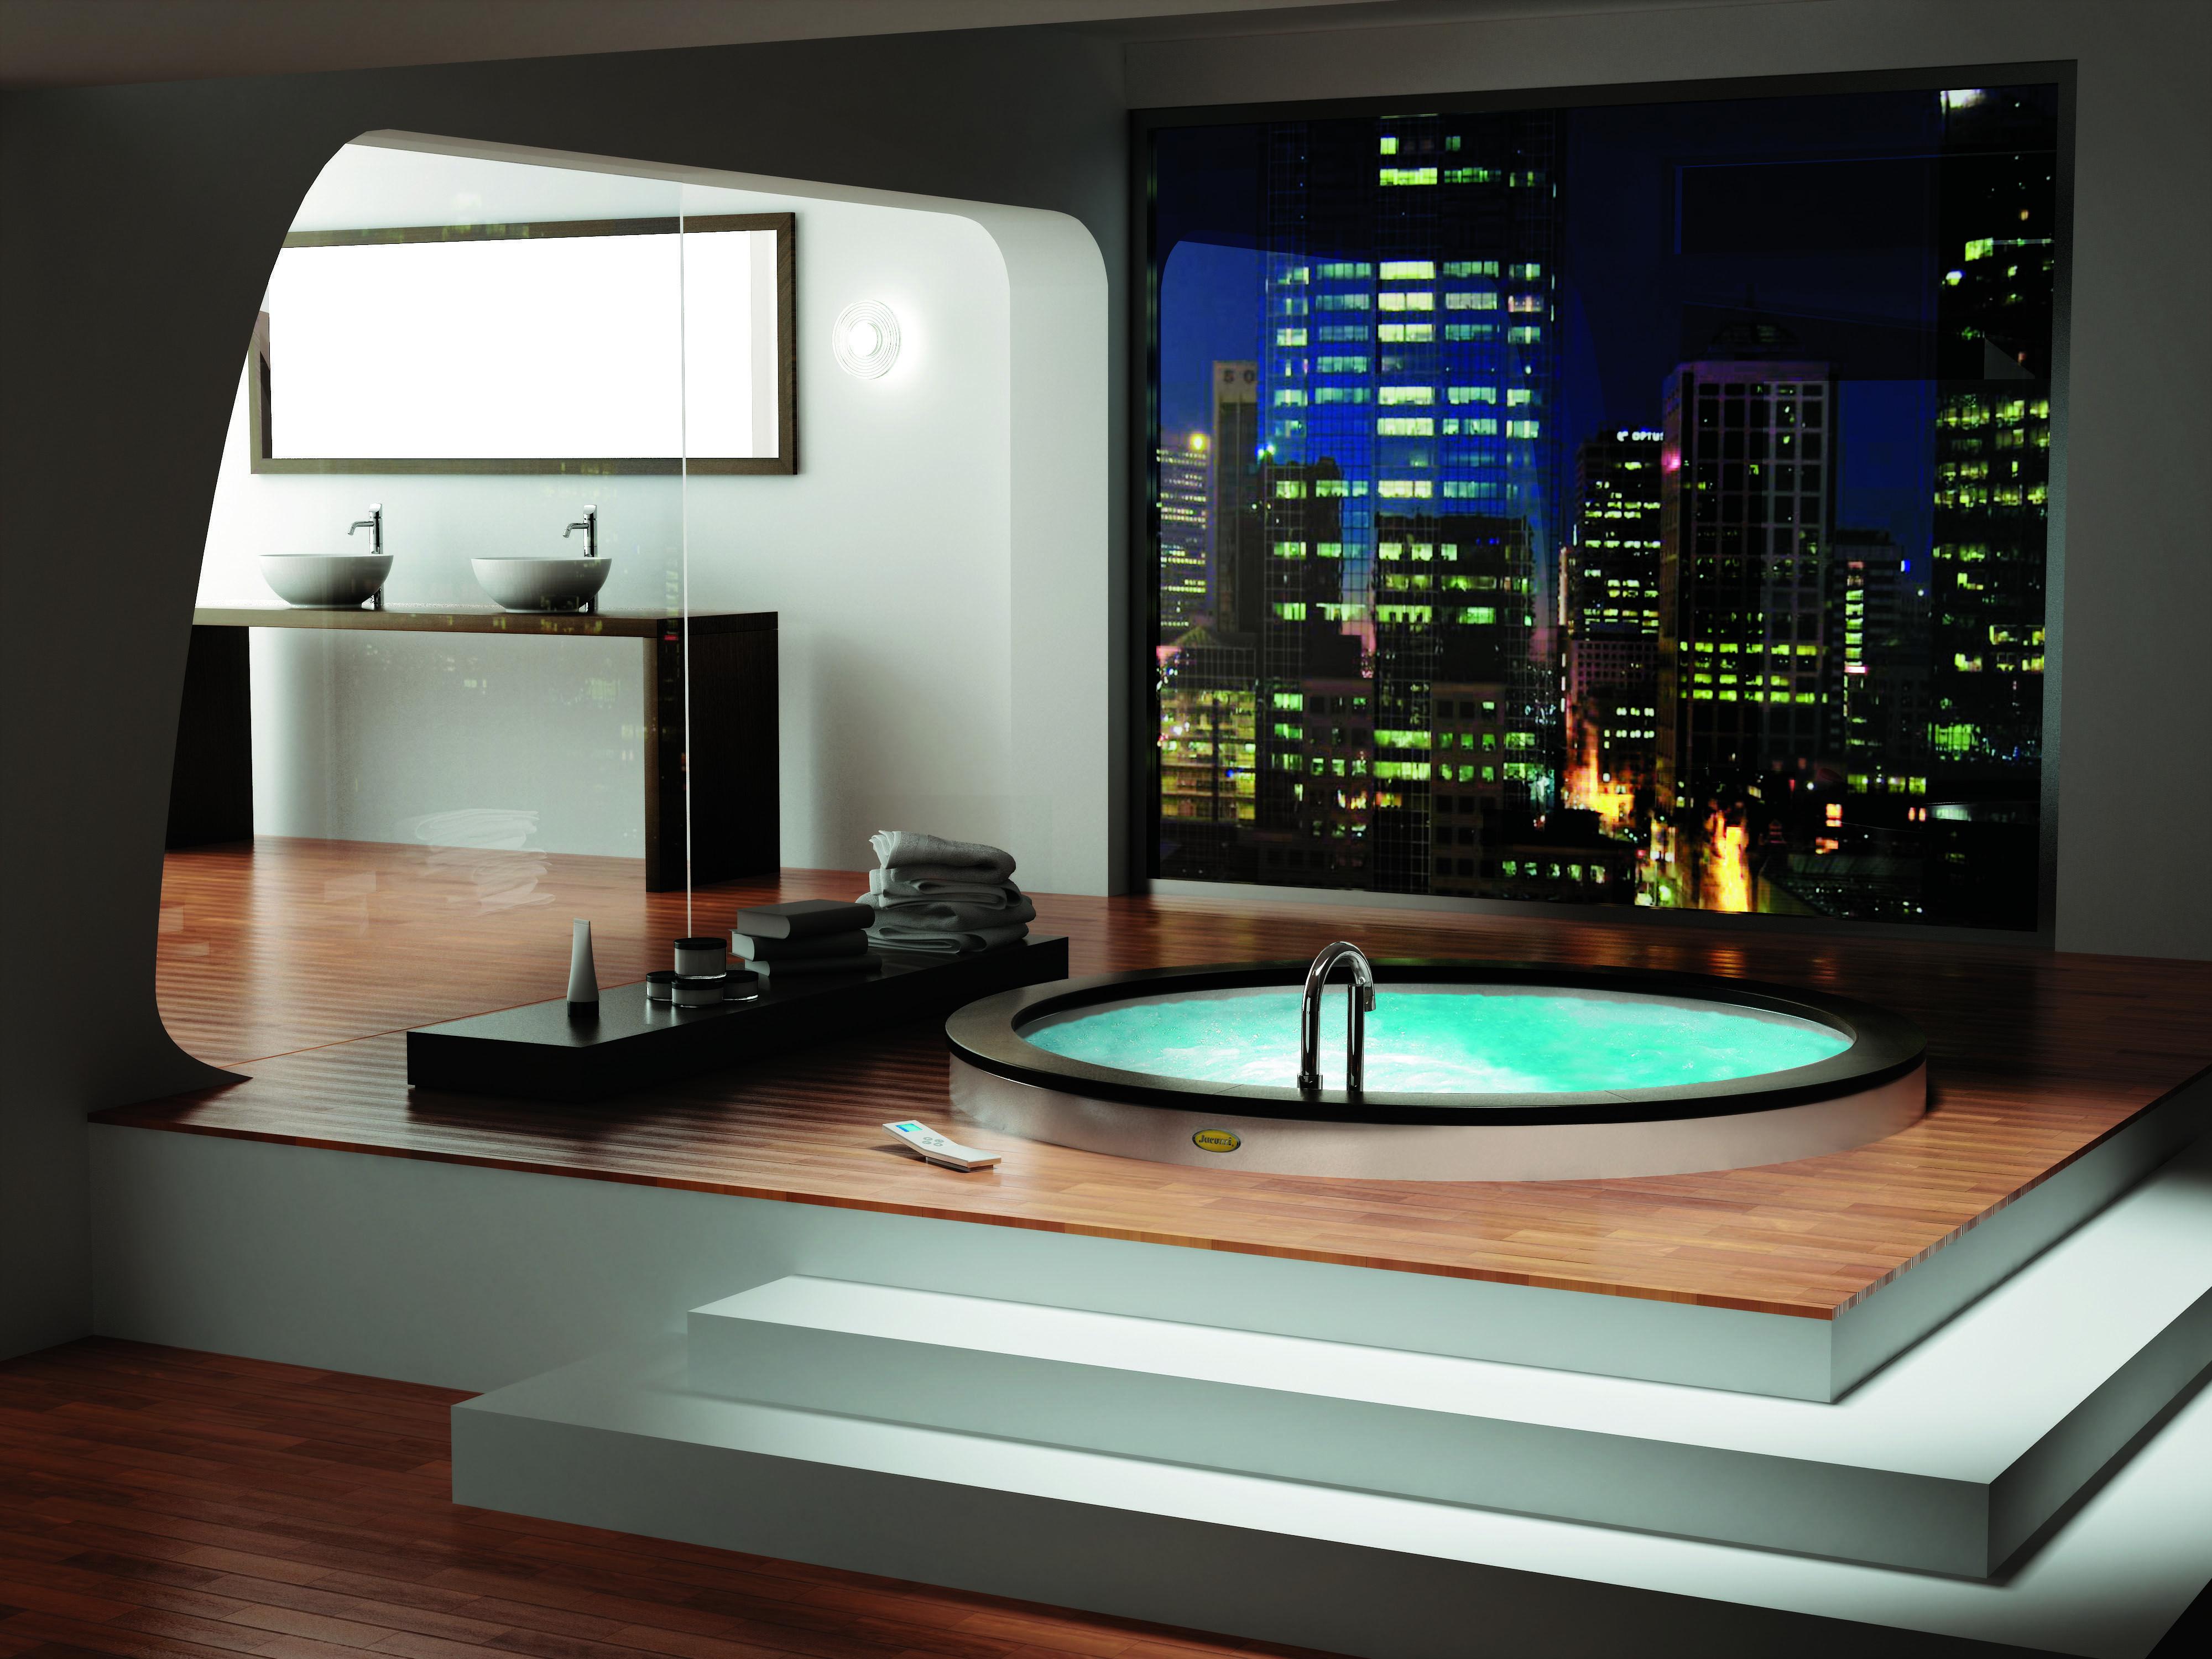 Bath Luxury Round Jacuzzi Design